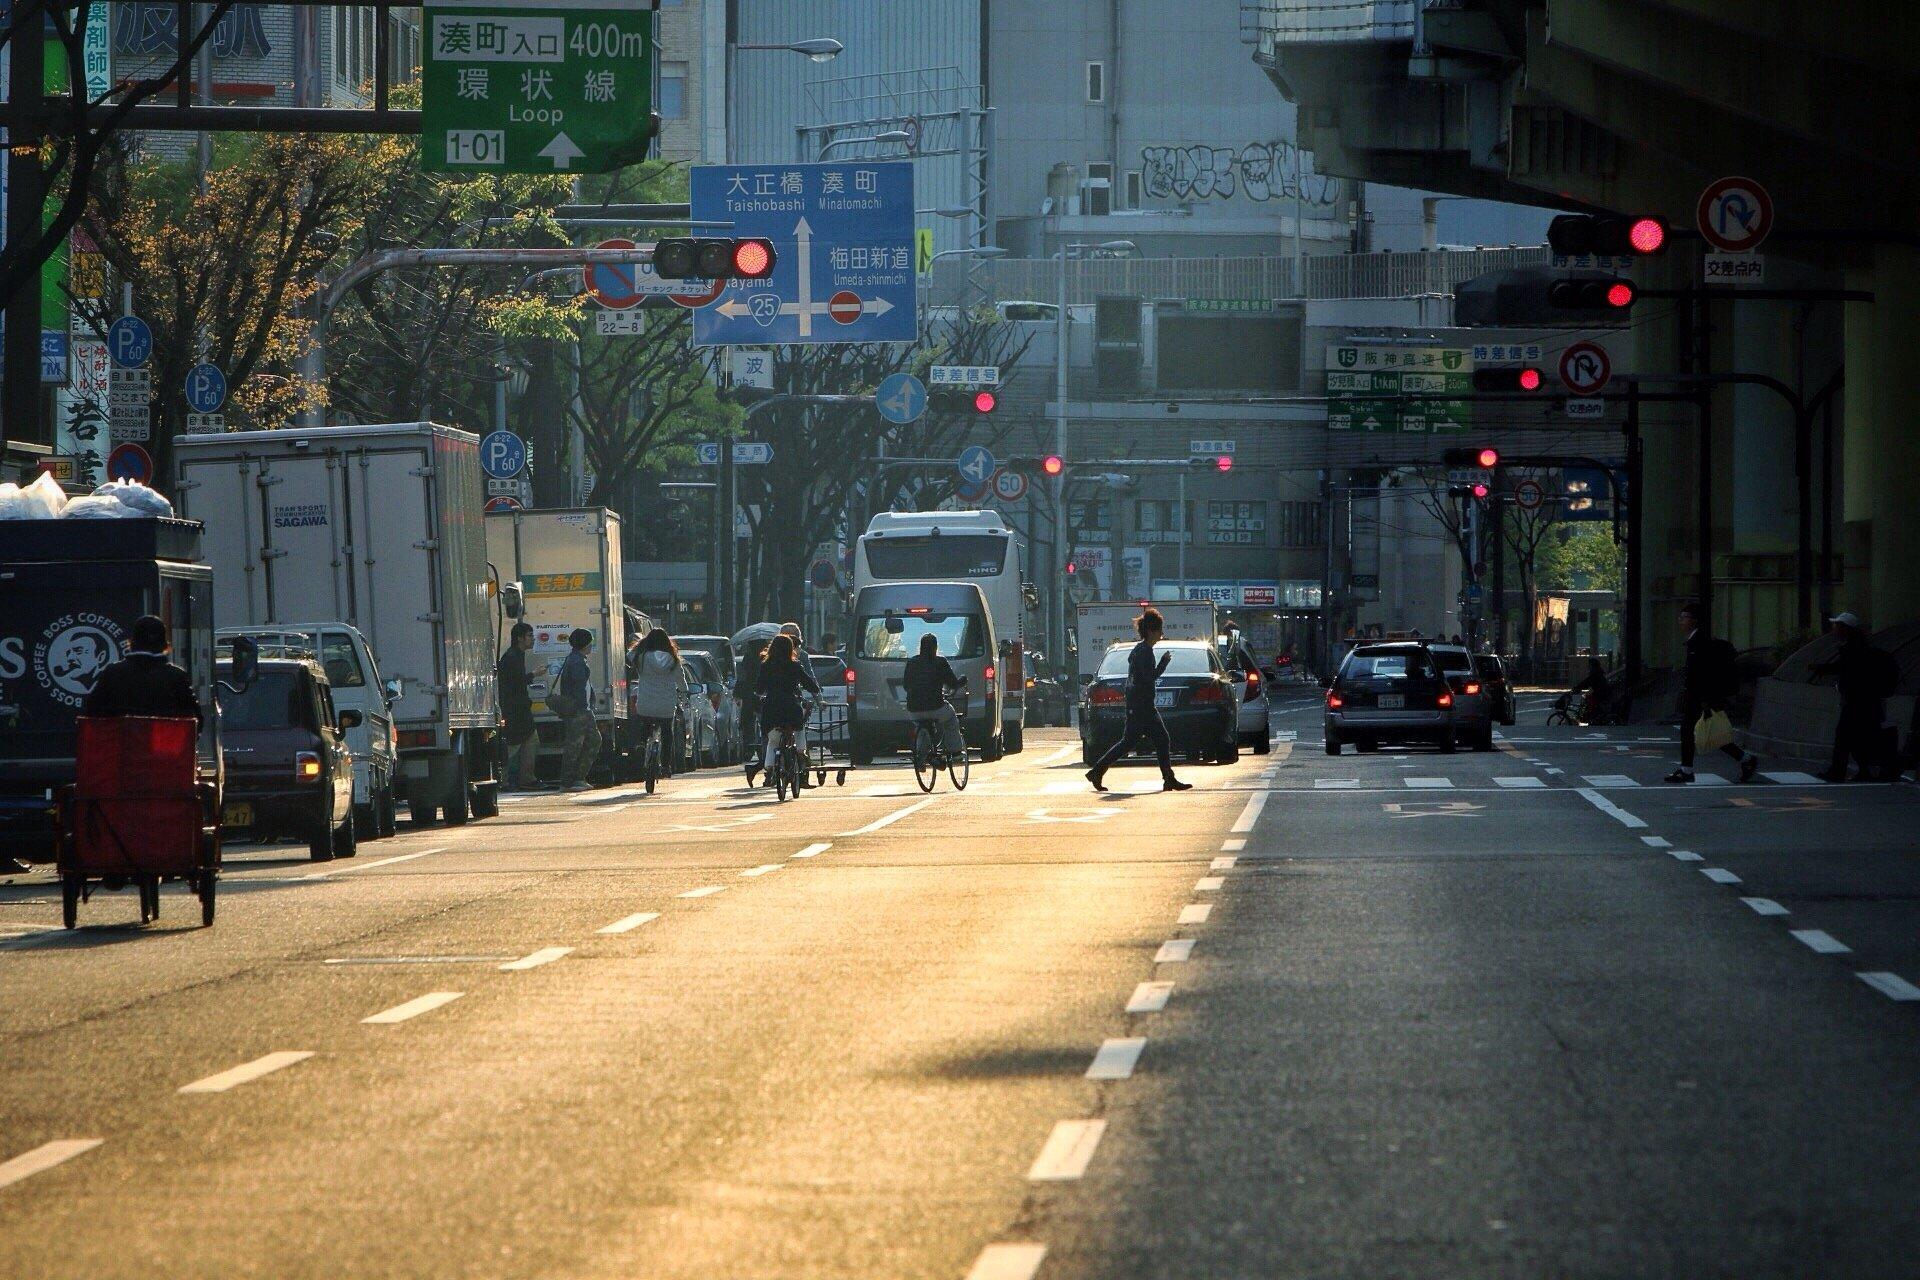 sunset-in-osaka-streetphotography-foto-blog-kasuma